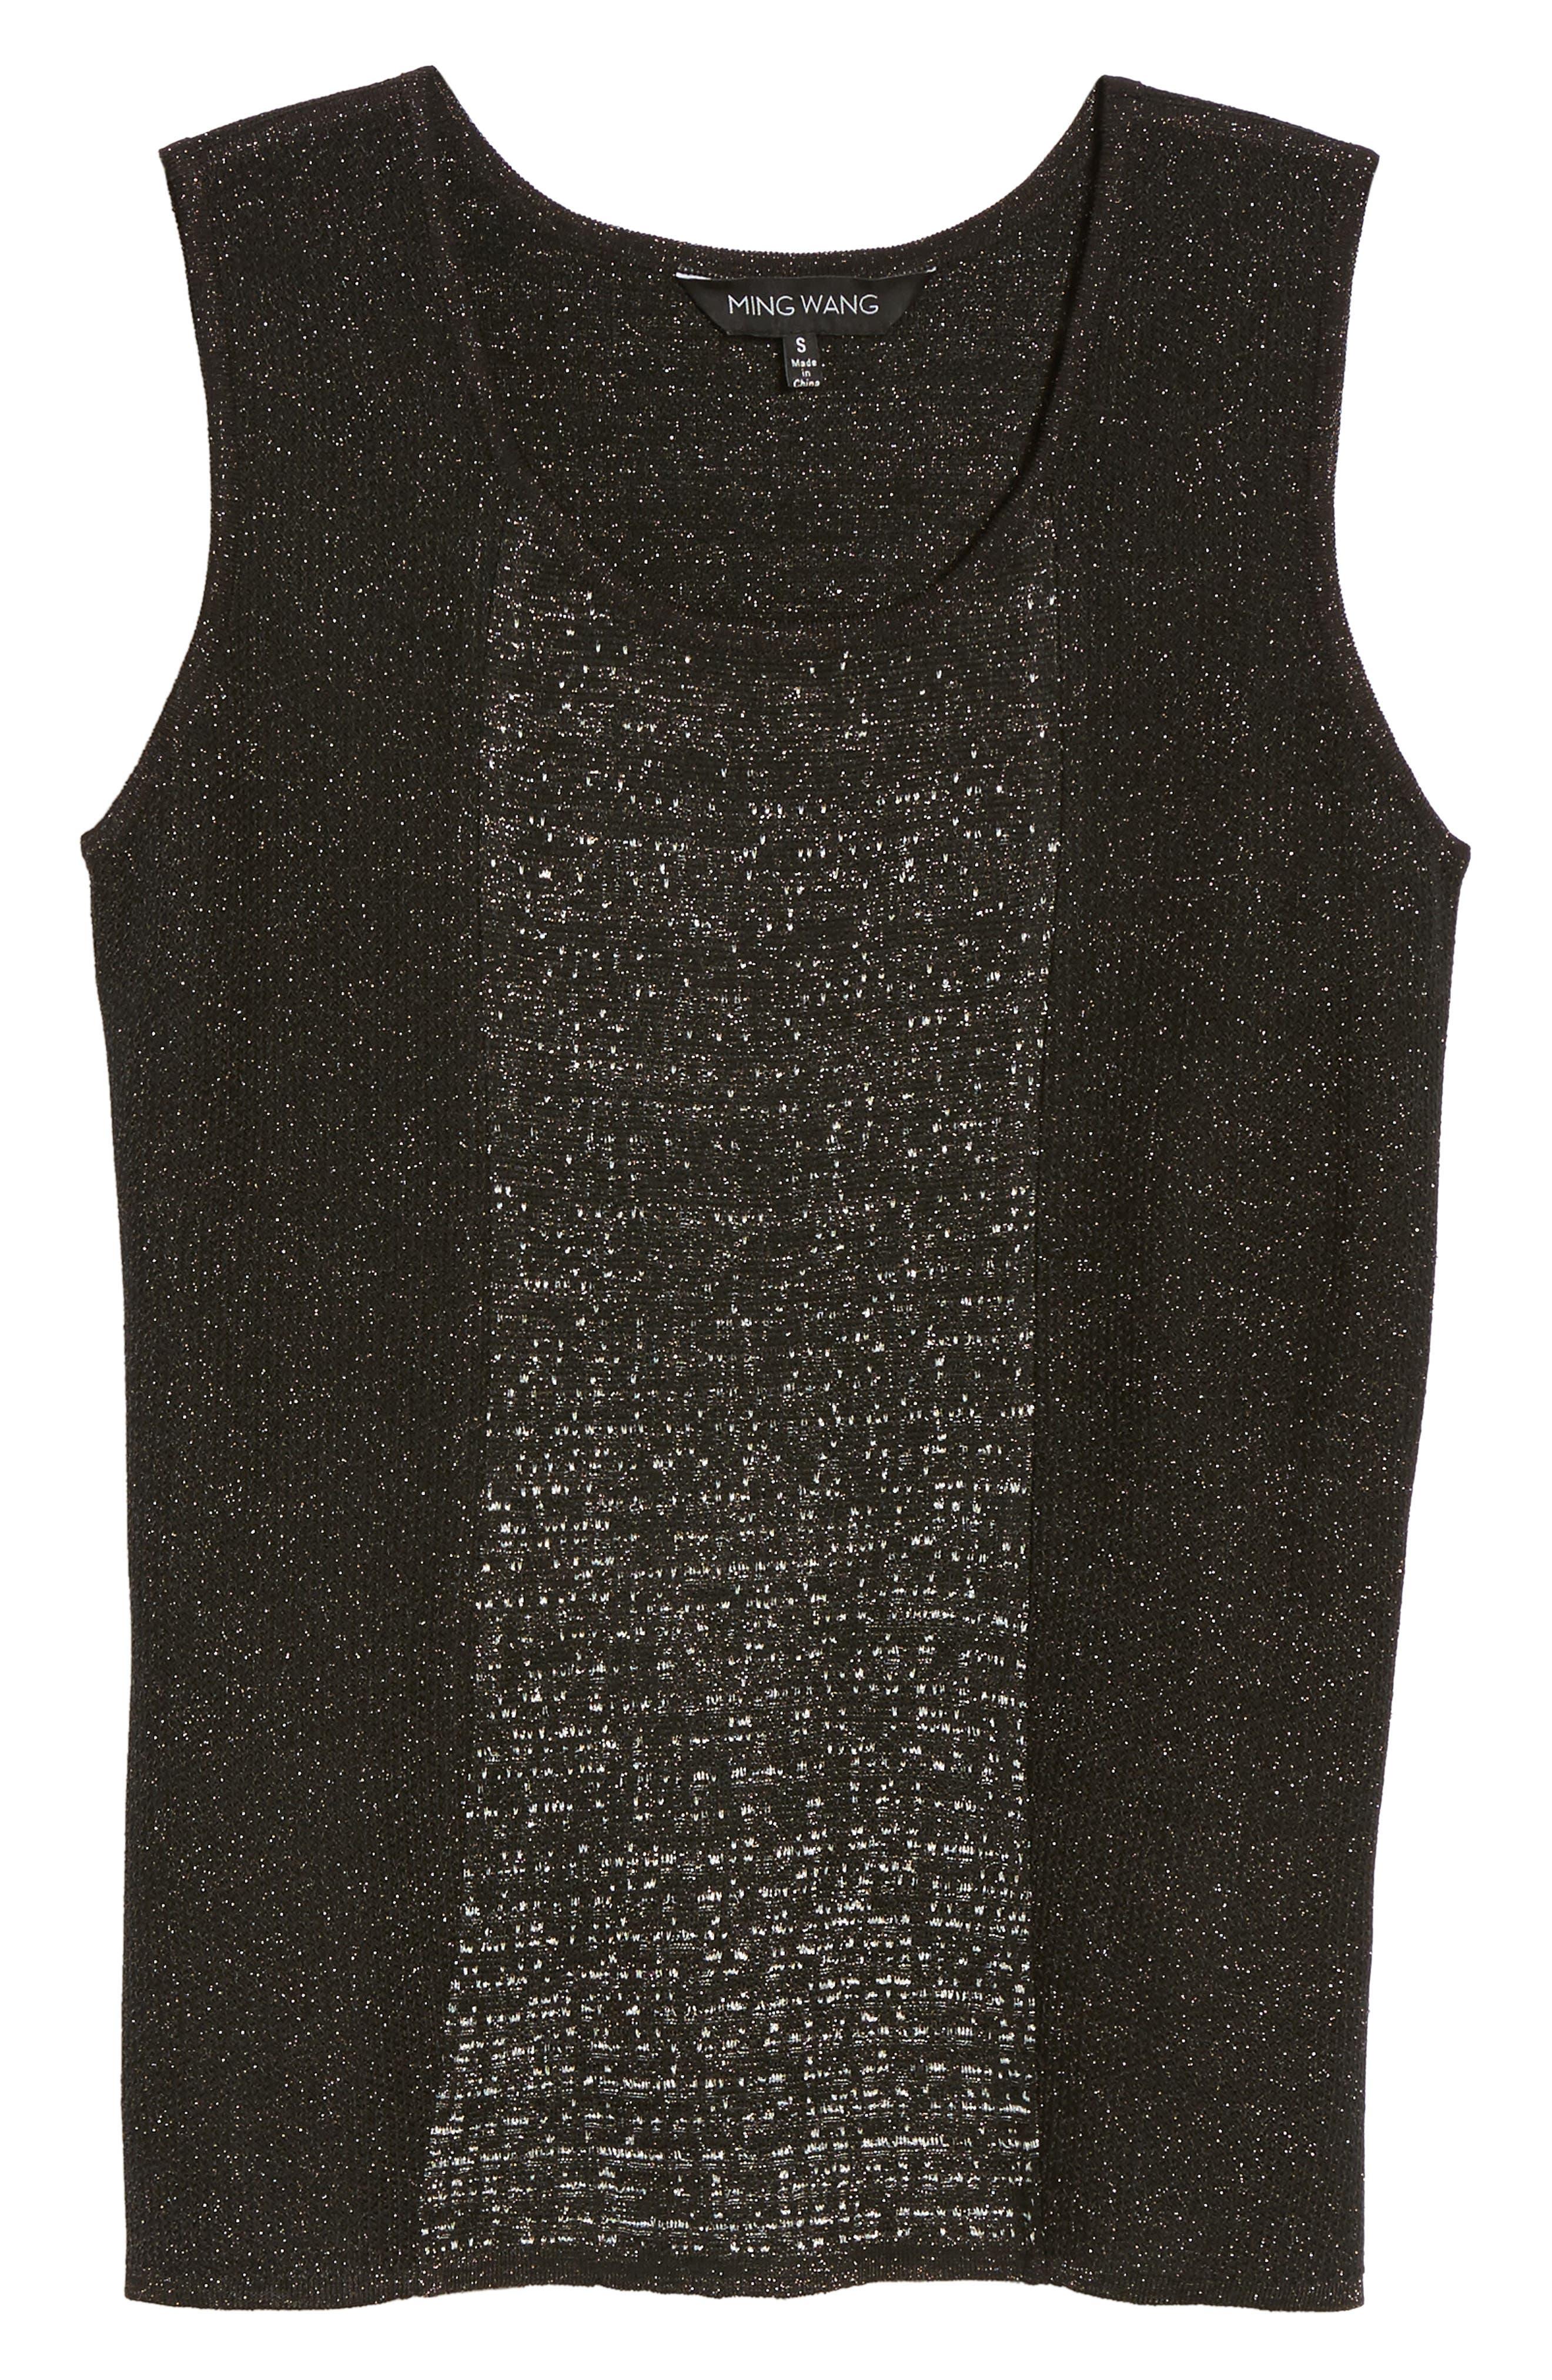 Scoop Neck Metallic Knit Tank,                             Alternate thumbnail 6, color,                             Black/ Silver